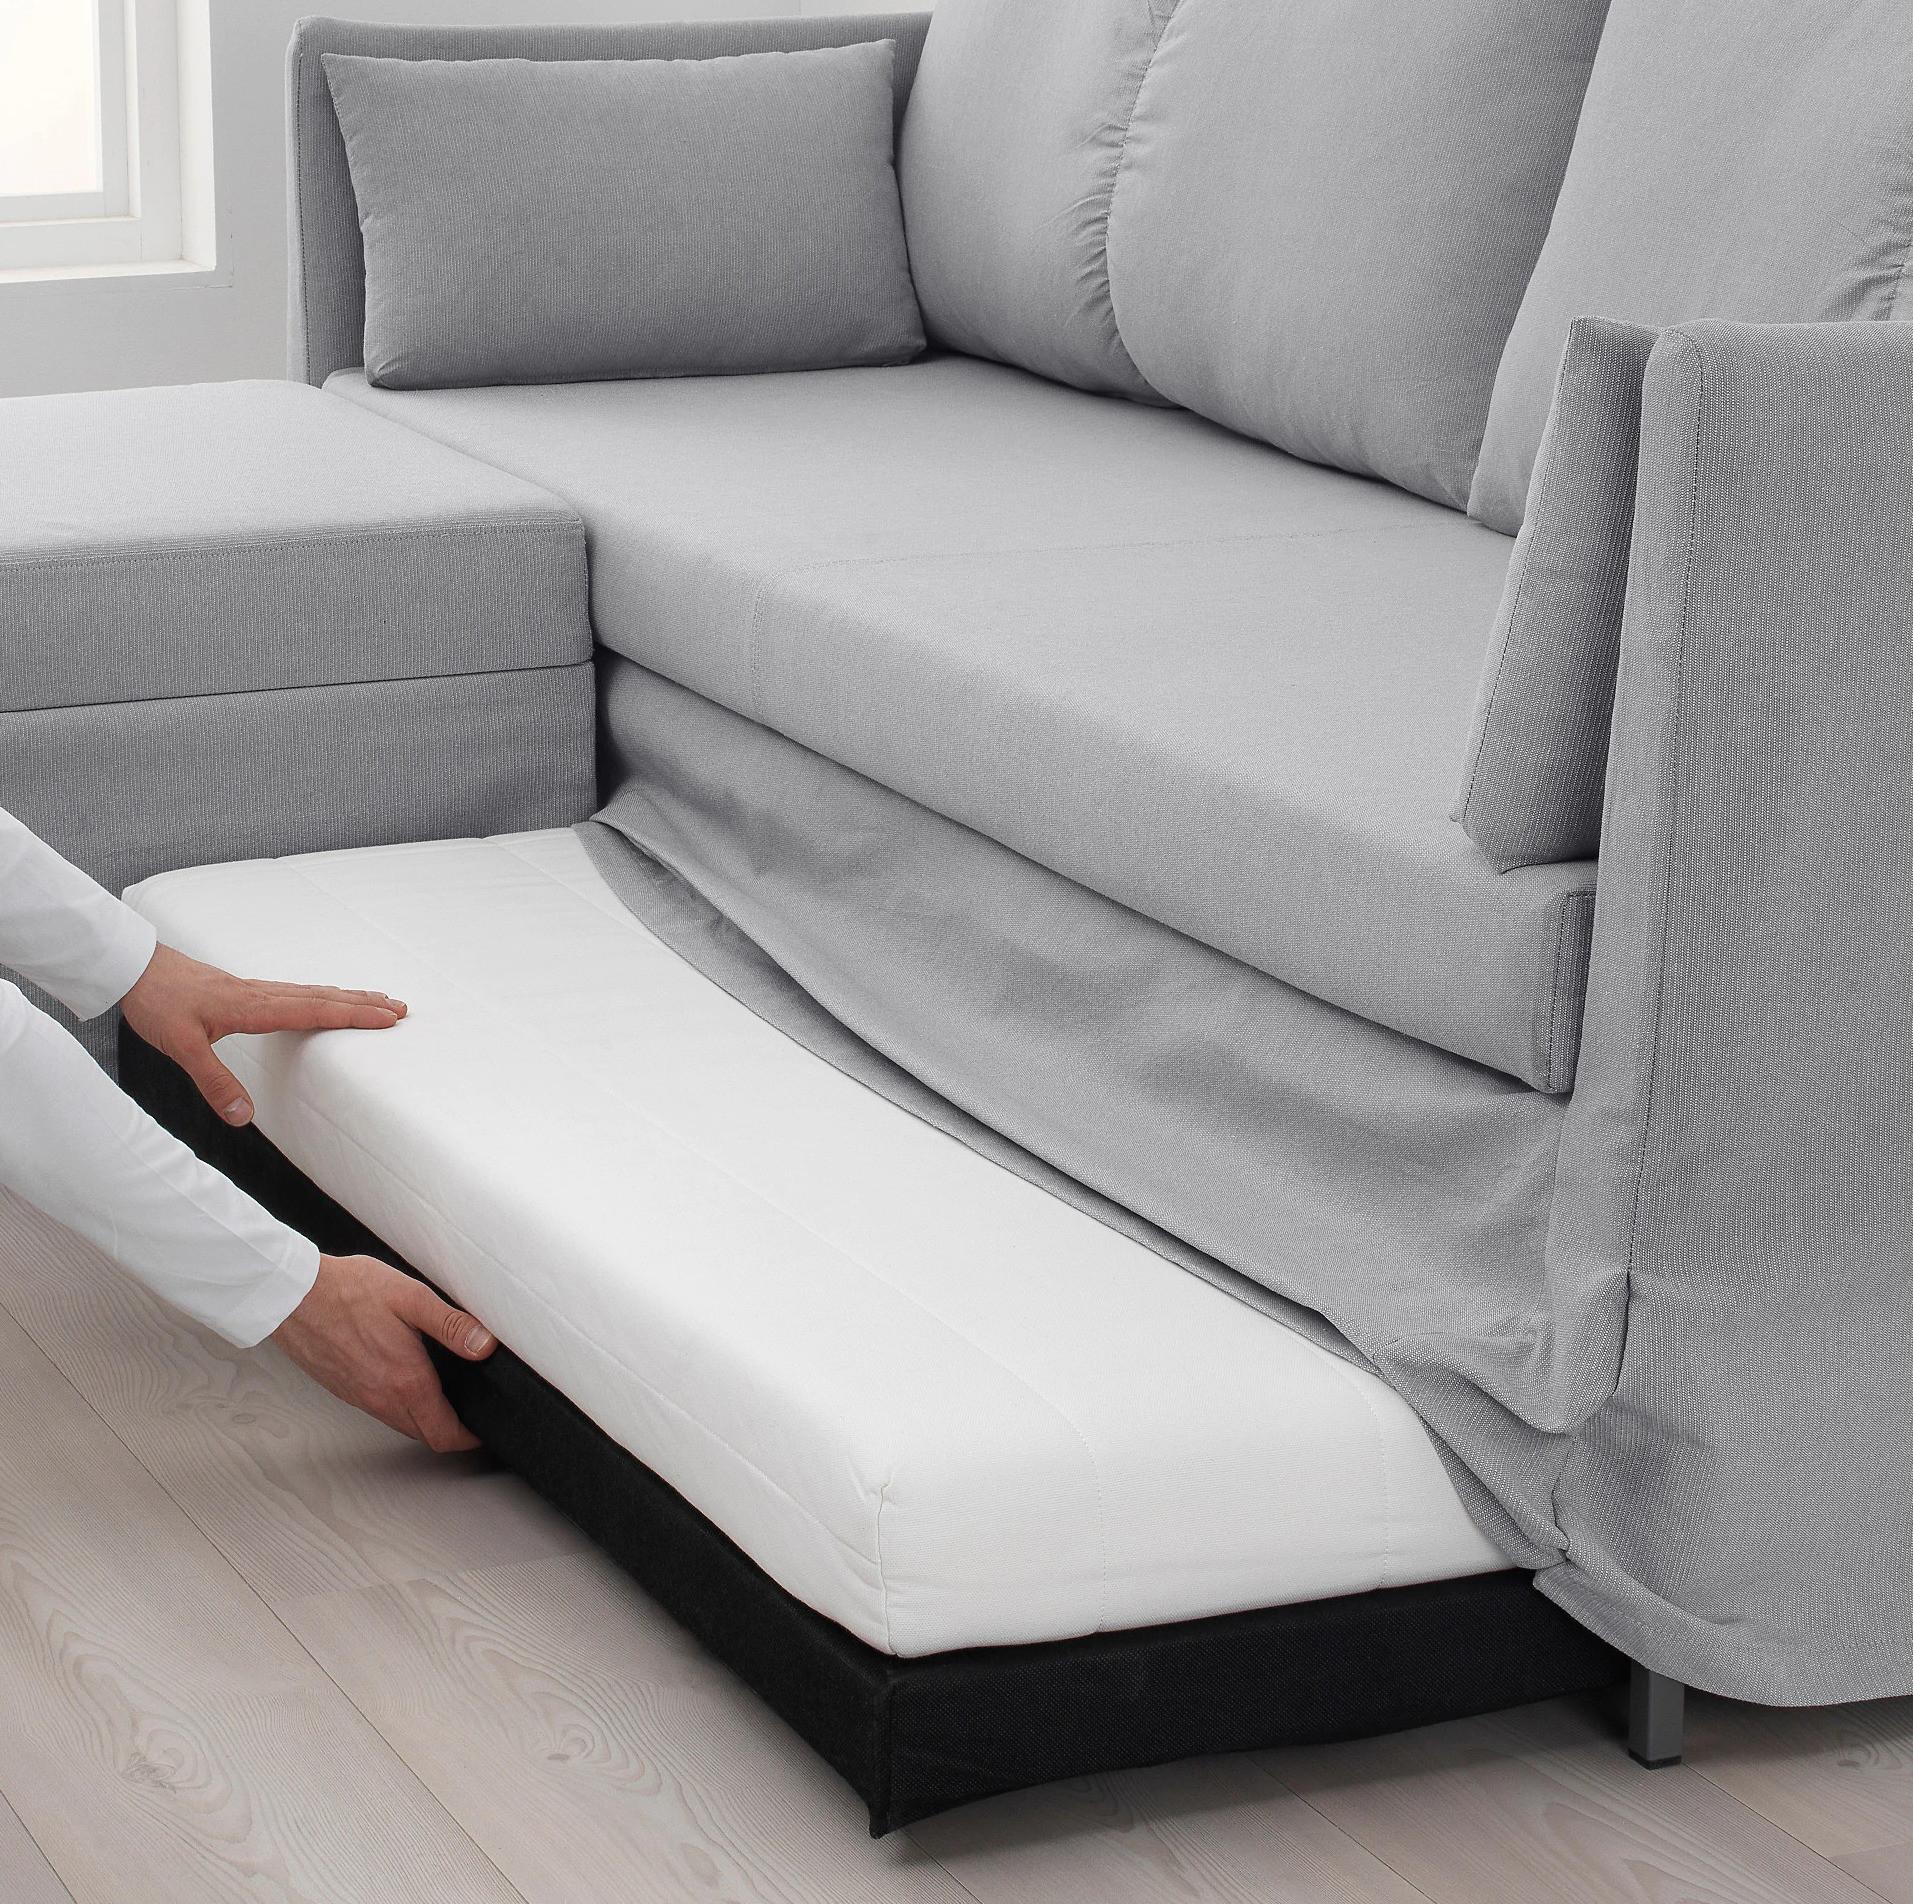 Top Rated Full Size Sleeper Sofa • Patio Ideas